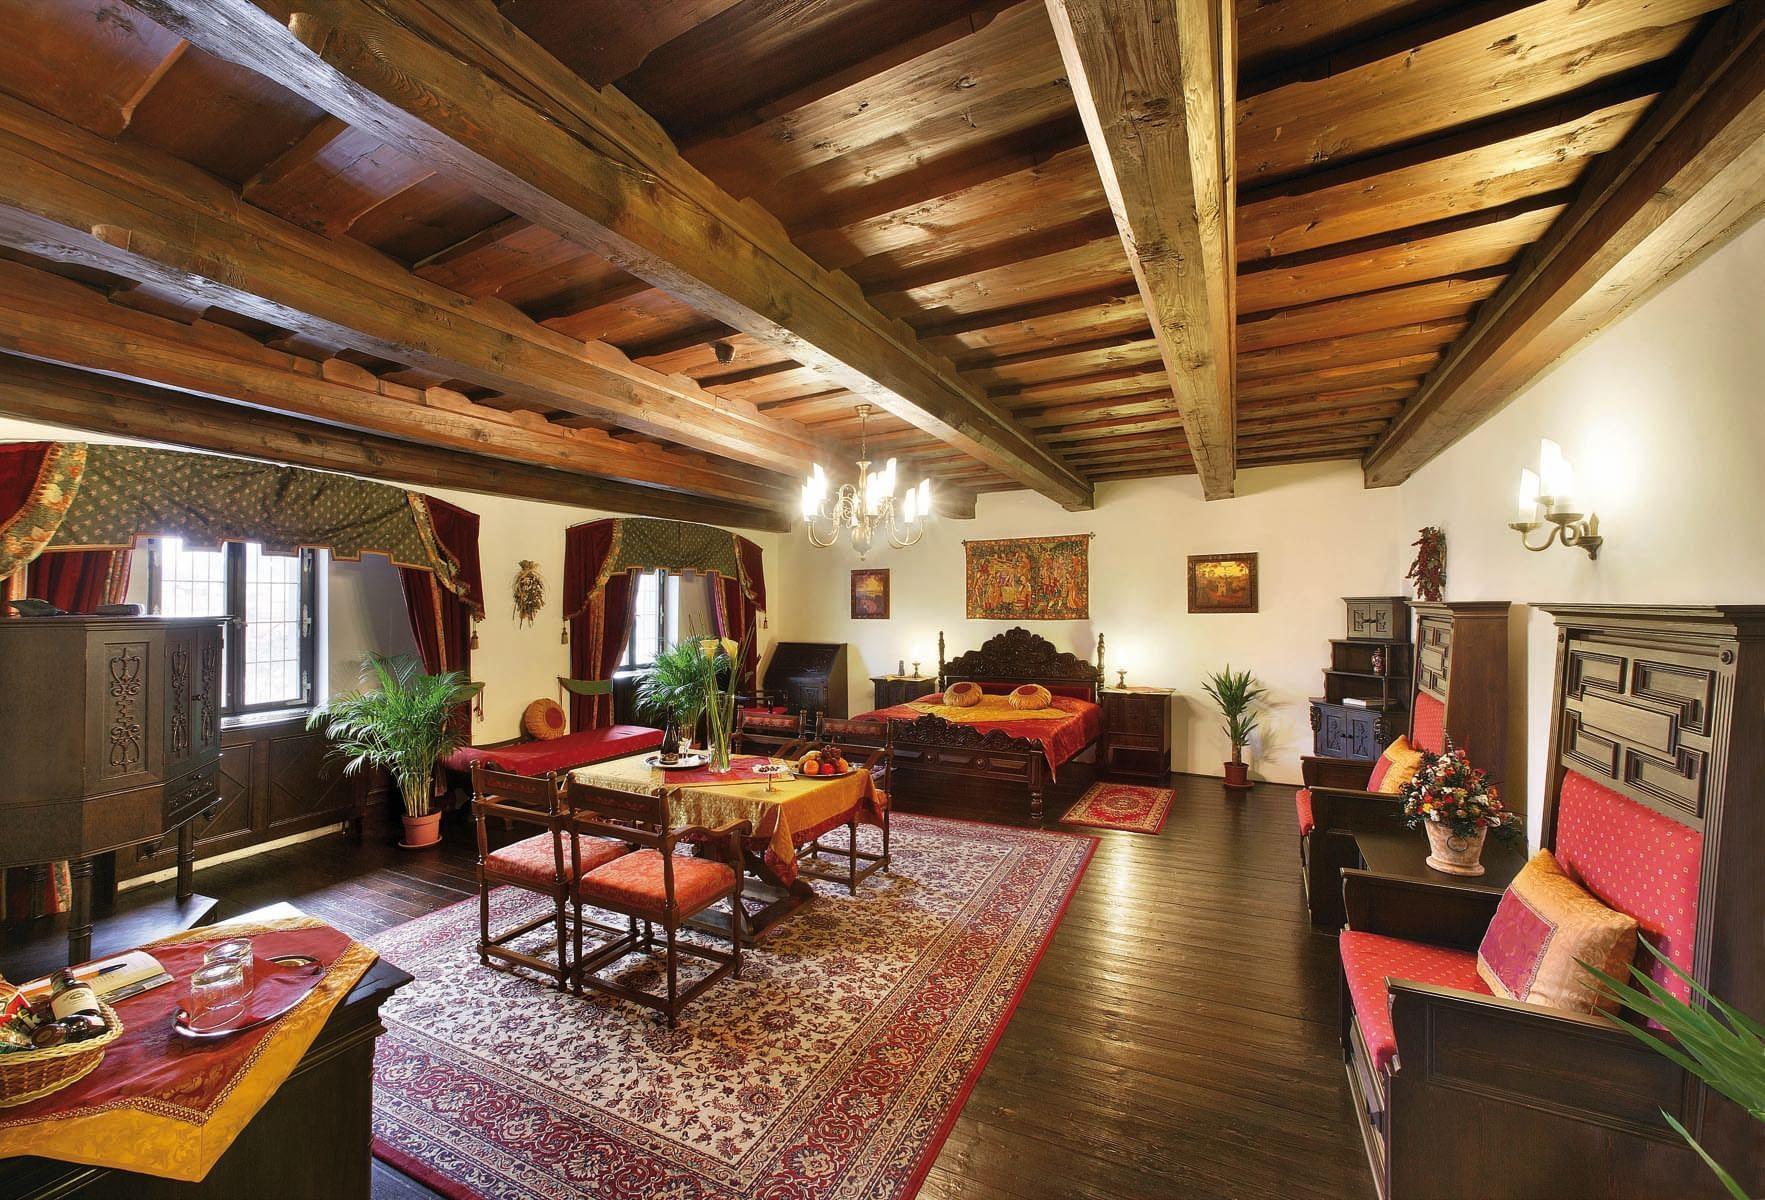 Deluxe Suite at Hotel Ruze, Český Krumlov, Czech Republic